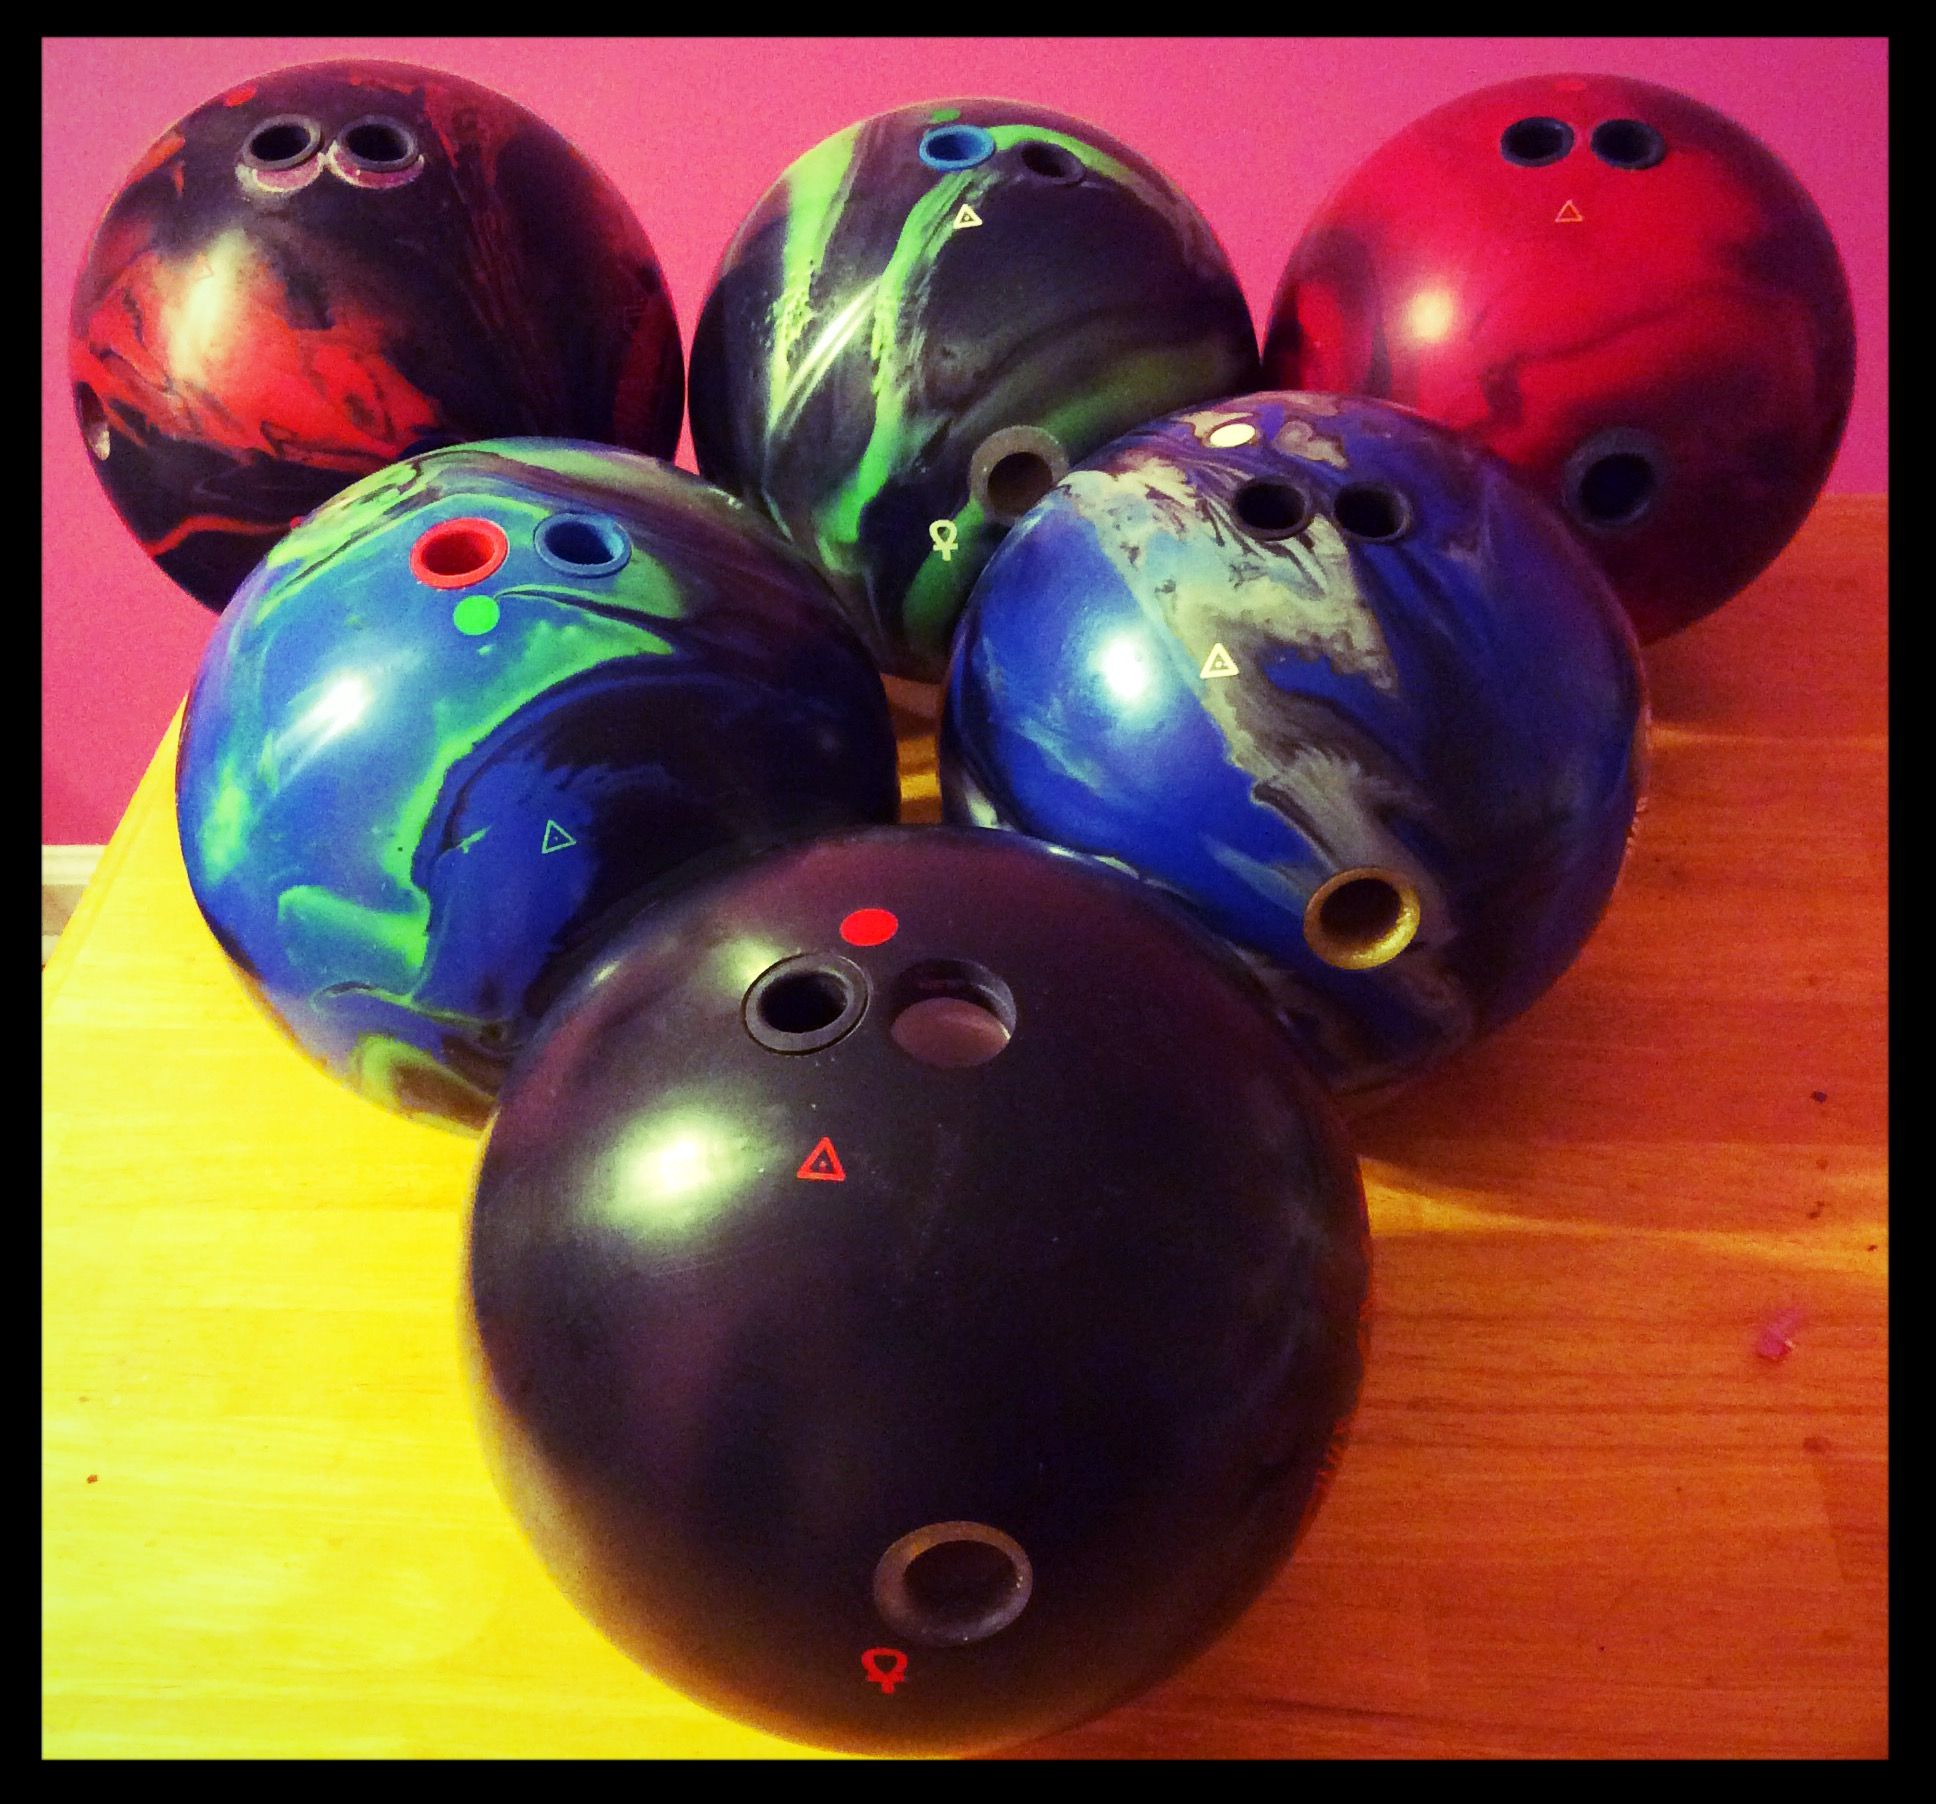 Pyramid Asymmetrical Balls Minus The Chosen Path Solid Ball Bowling Ball Pyramids